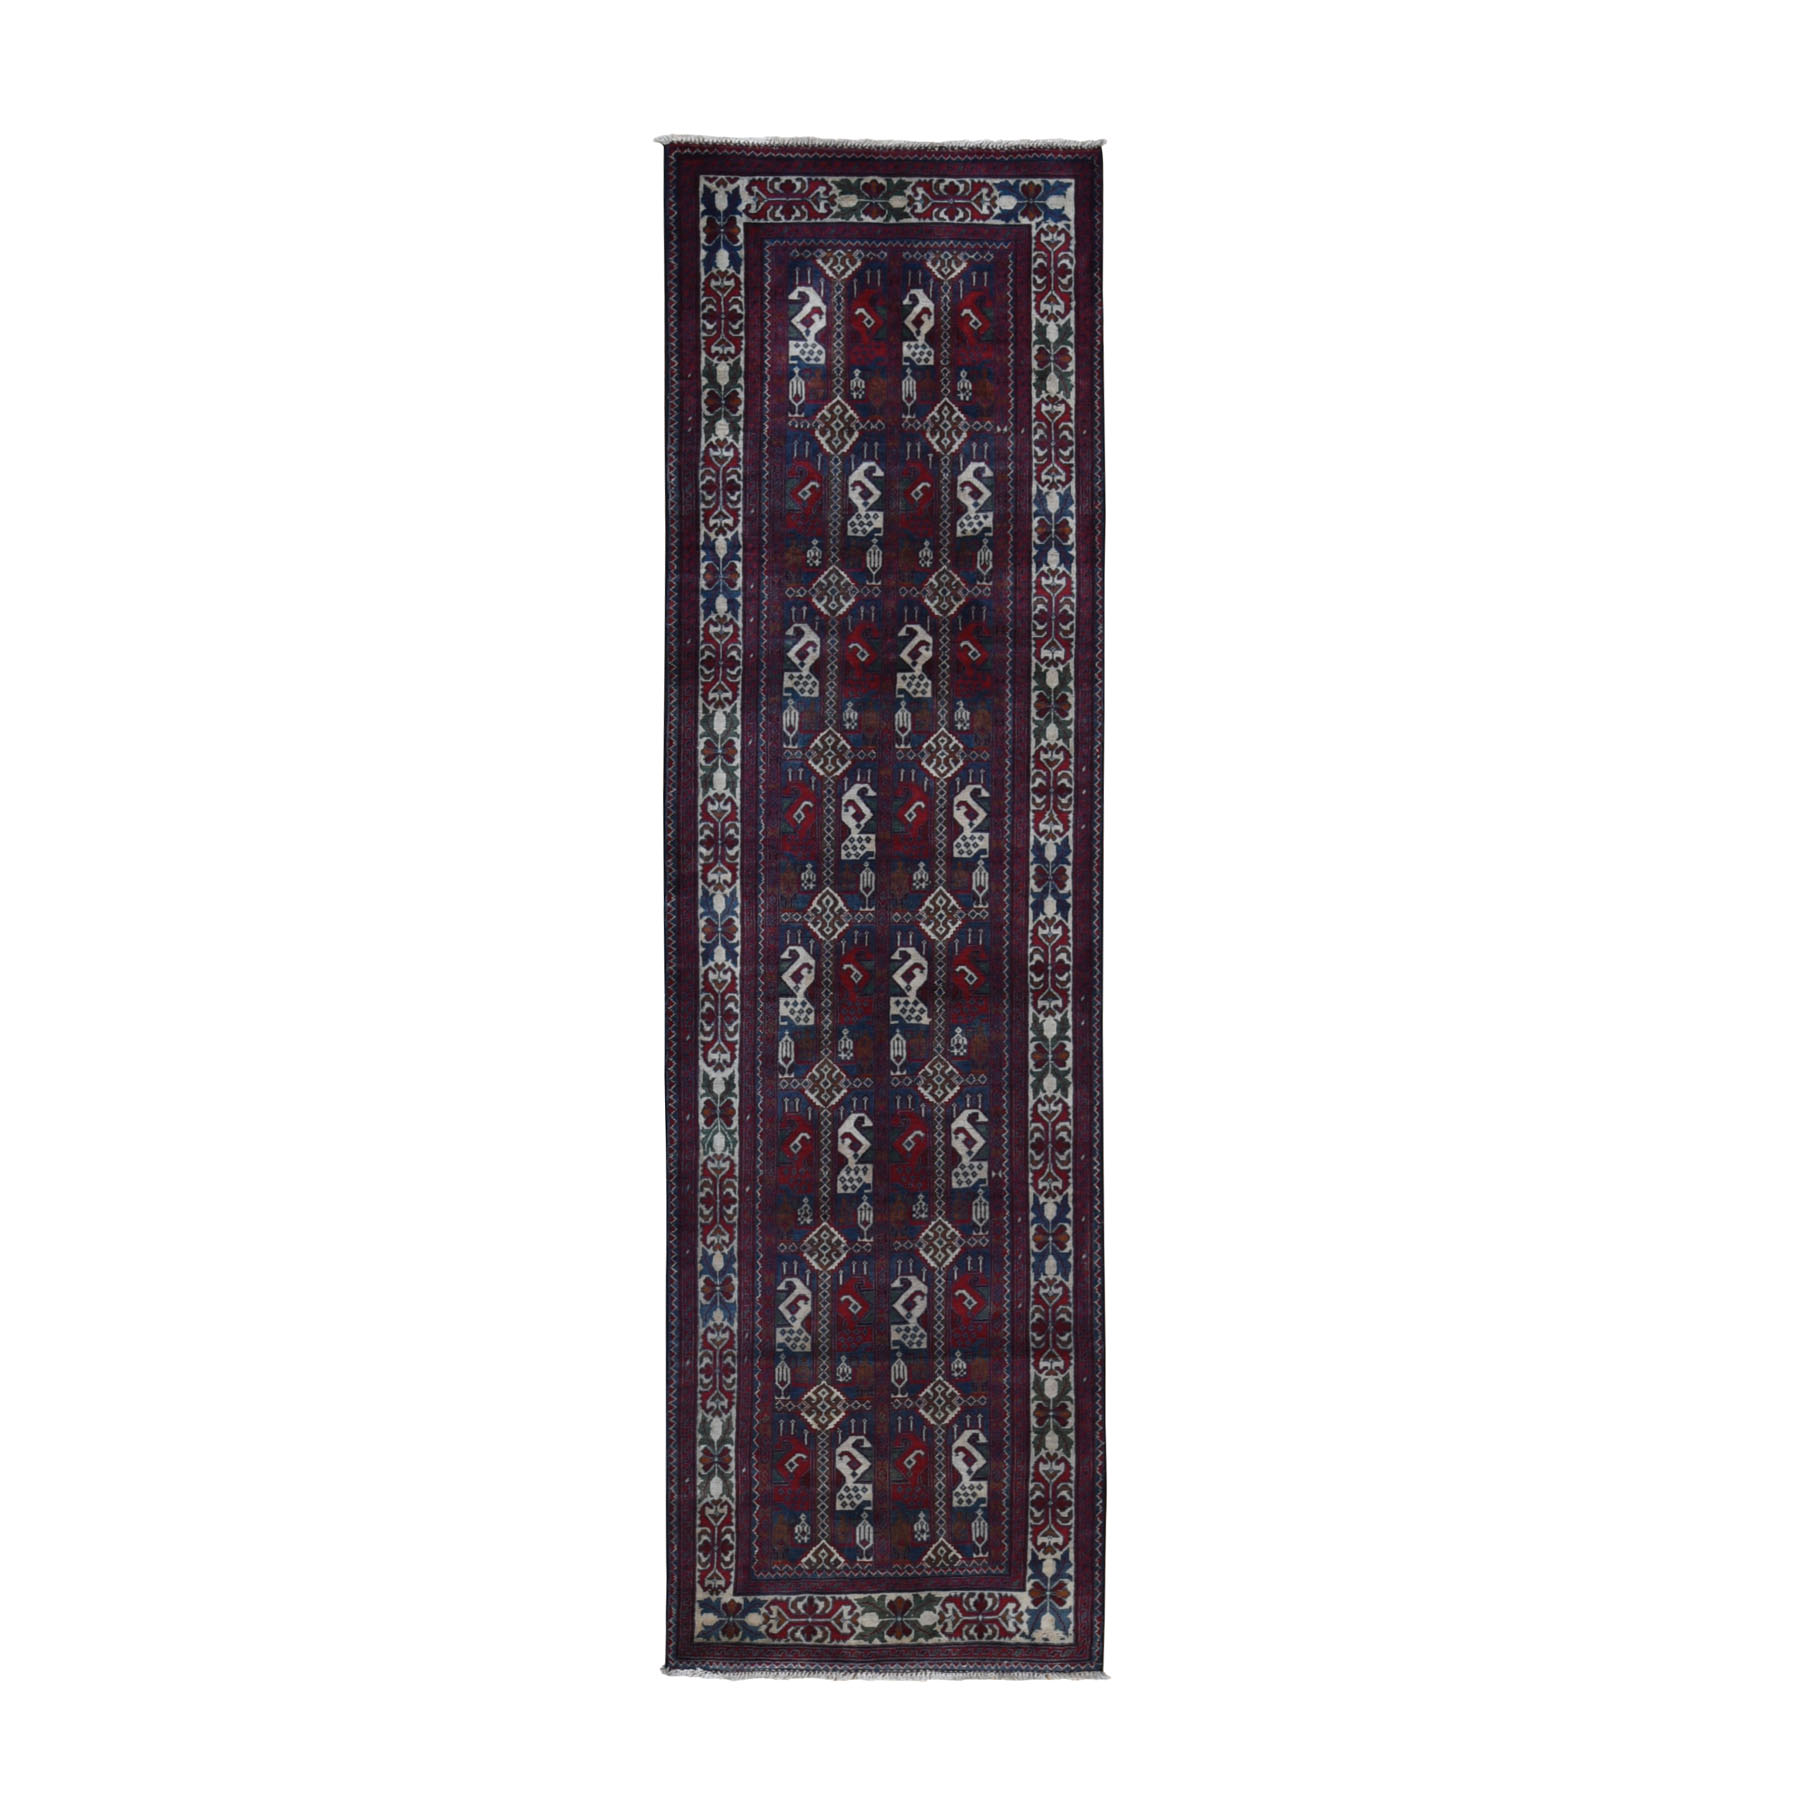 "2'6""x9'4"" Blue Afghan Khamyab Geometric Motif Runner Pure Wool Hand Knotted Oriental Rug"